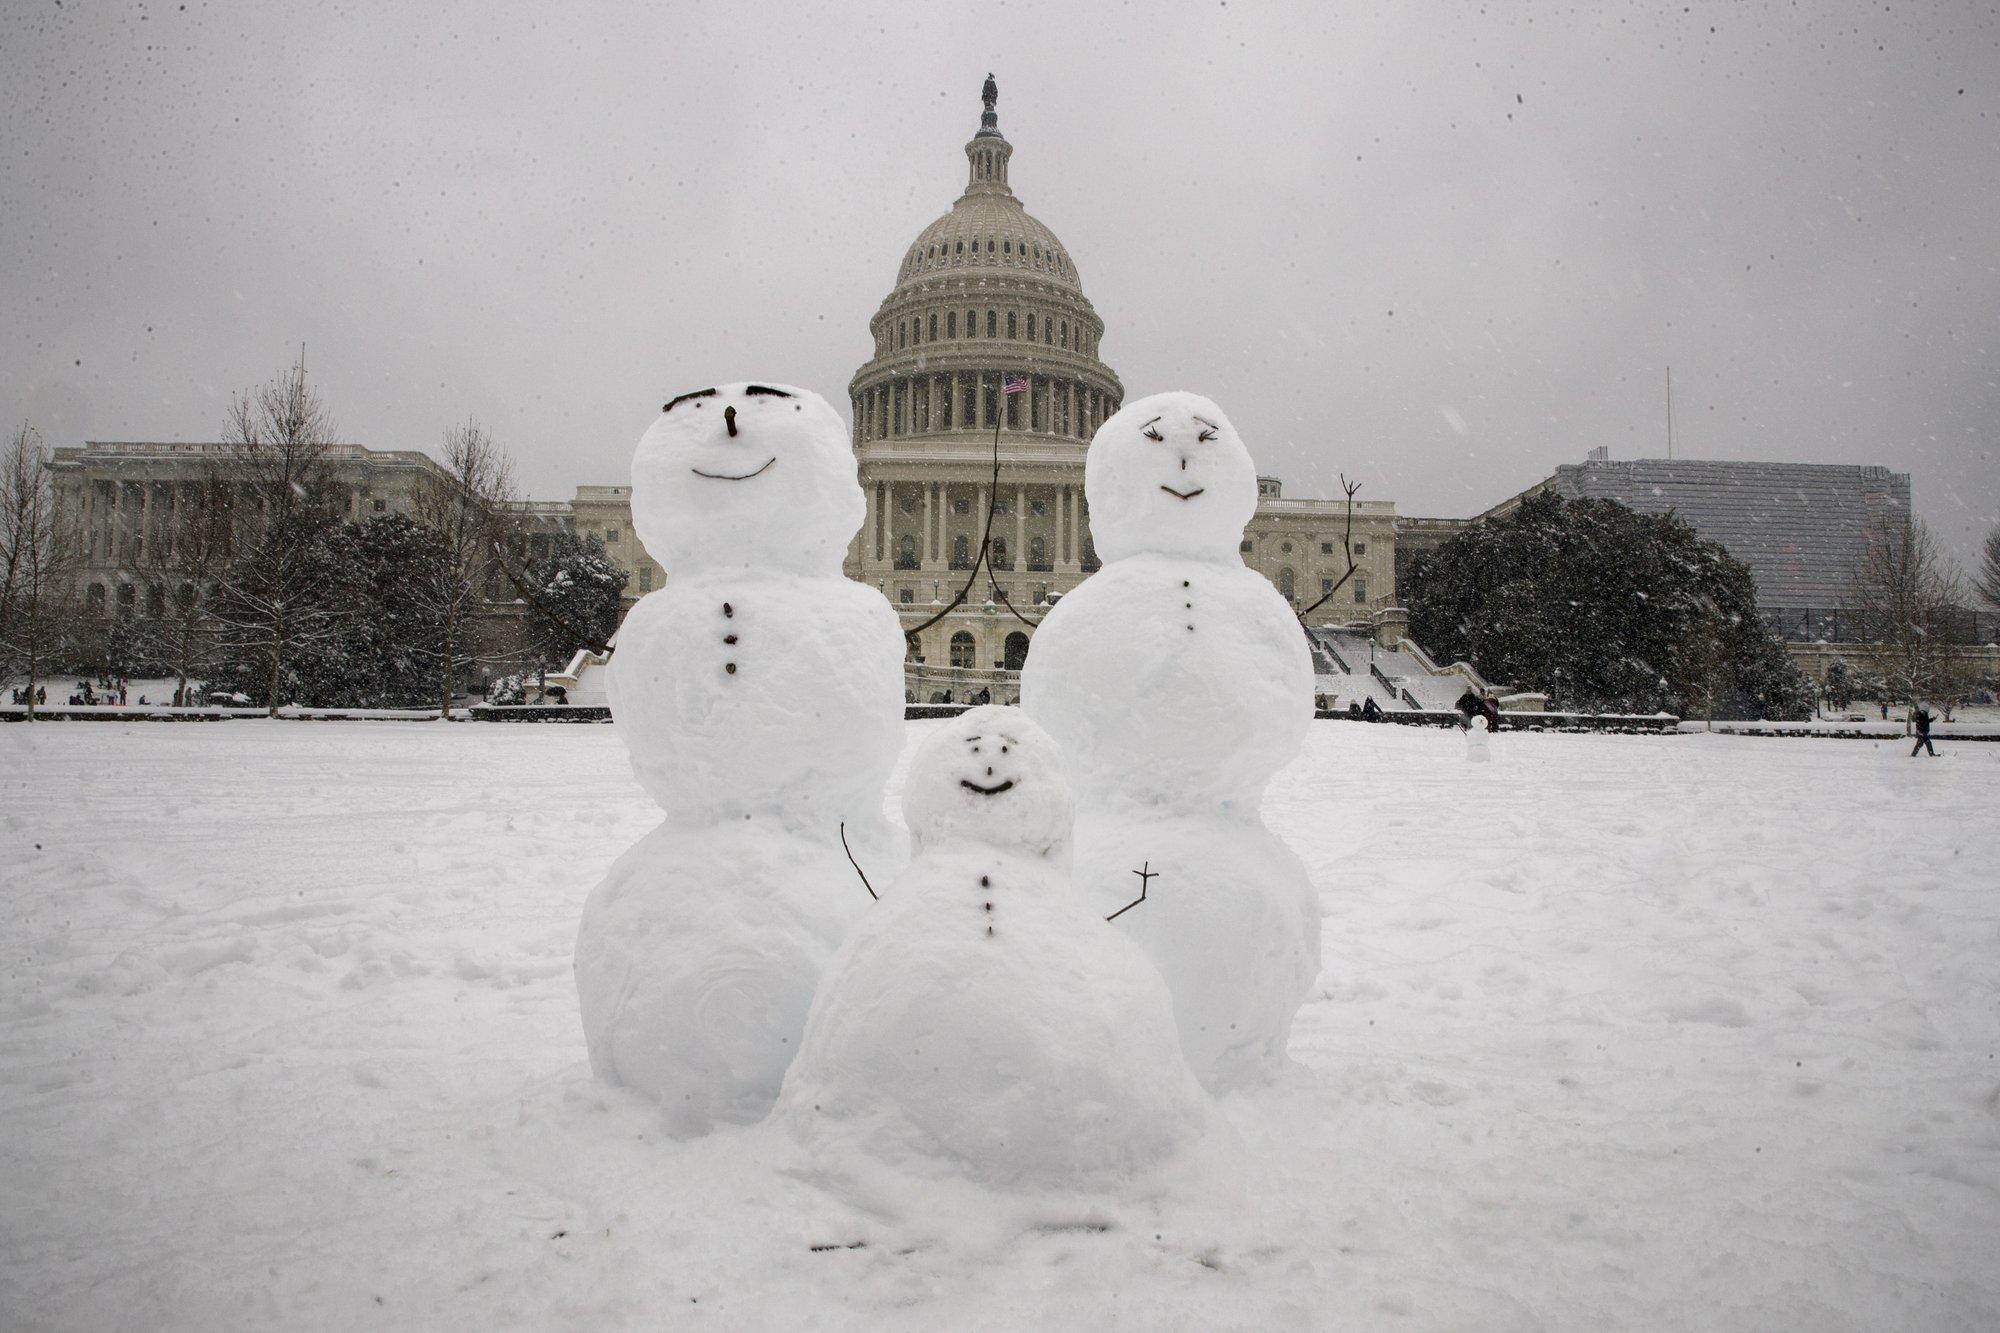 DC Snow_1547416603678.jpeg.jpg